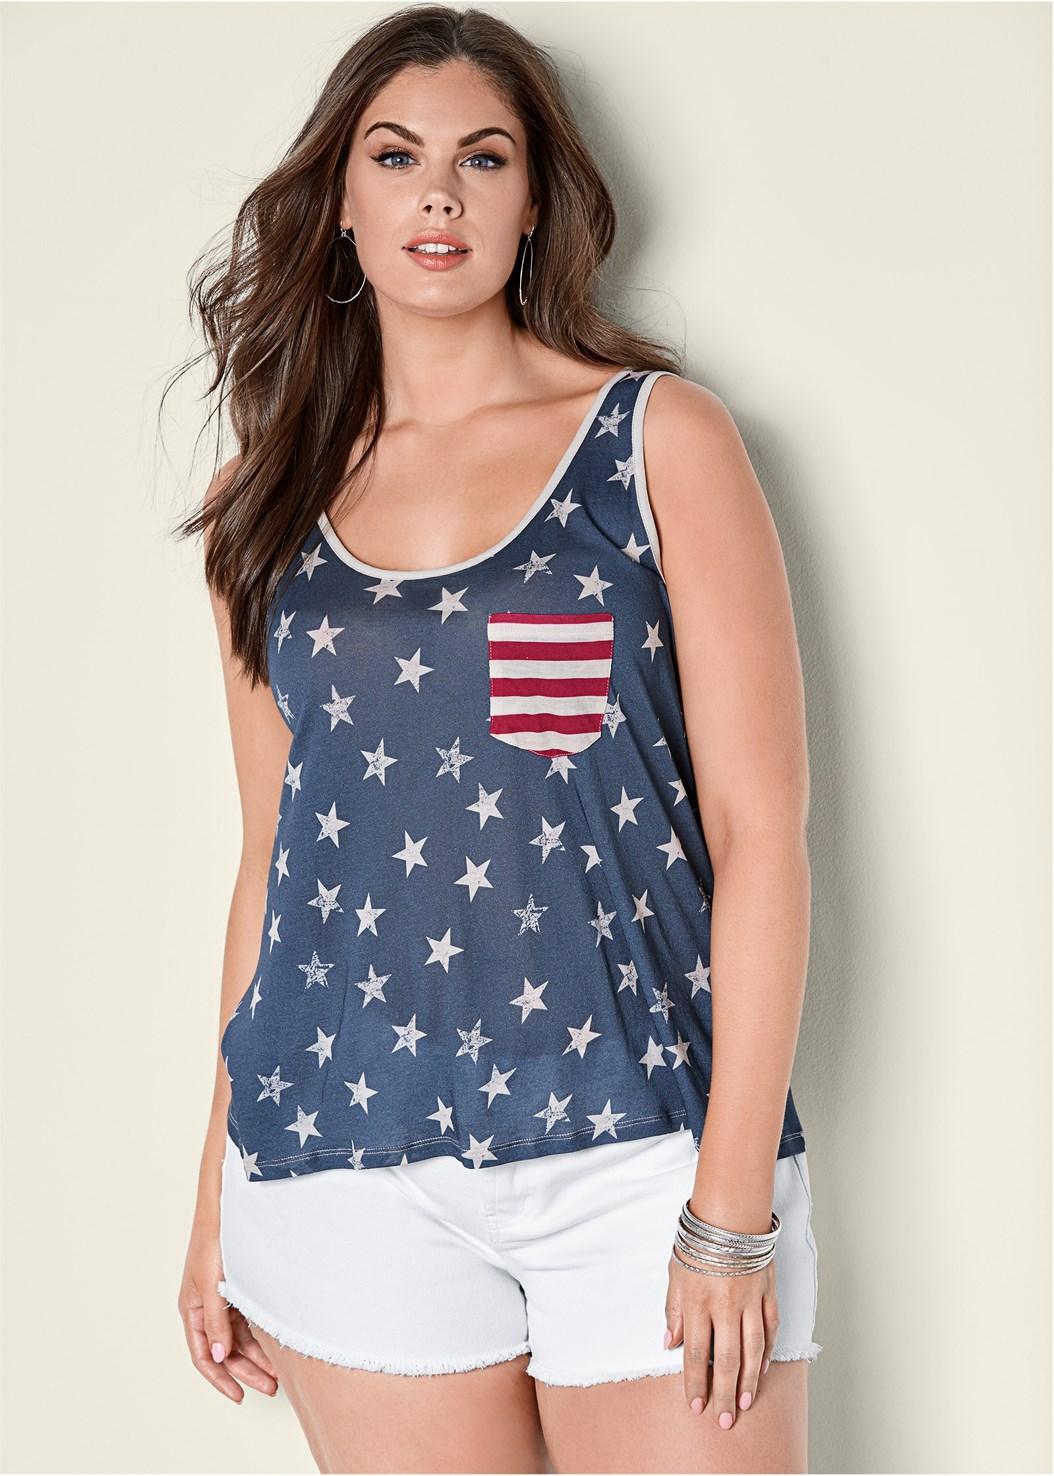 Stars And Stripes Knit Top,Star Cuff Capri Jeans,Frayed Cut Off Jean Shorts,Frayed Hem Denim Skirt,Denim Sandal